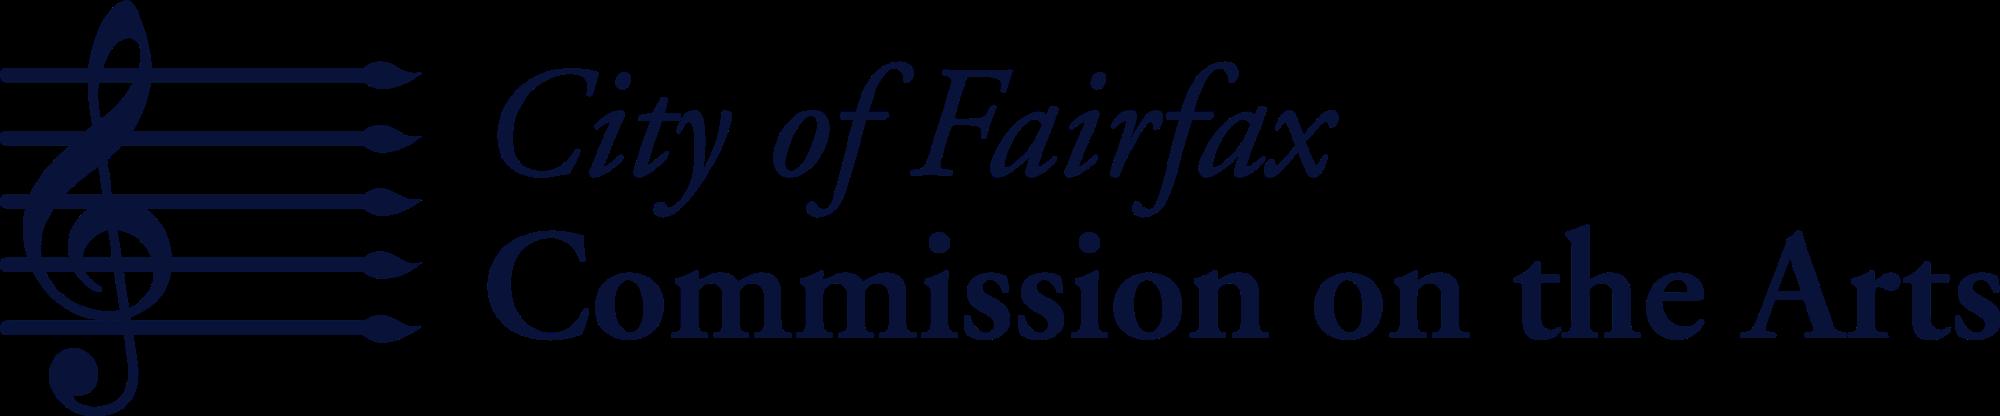 Commission on the art logo-cmyk2